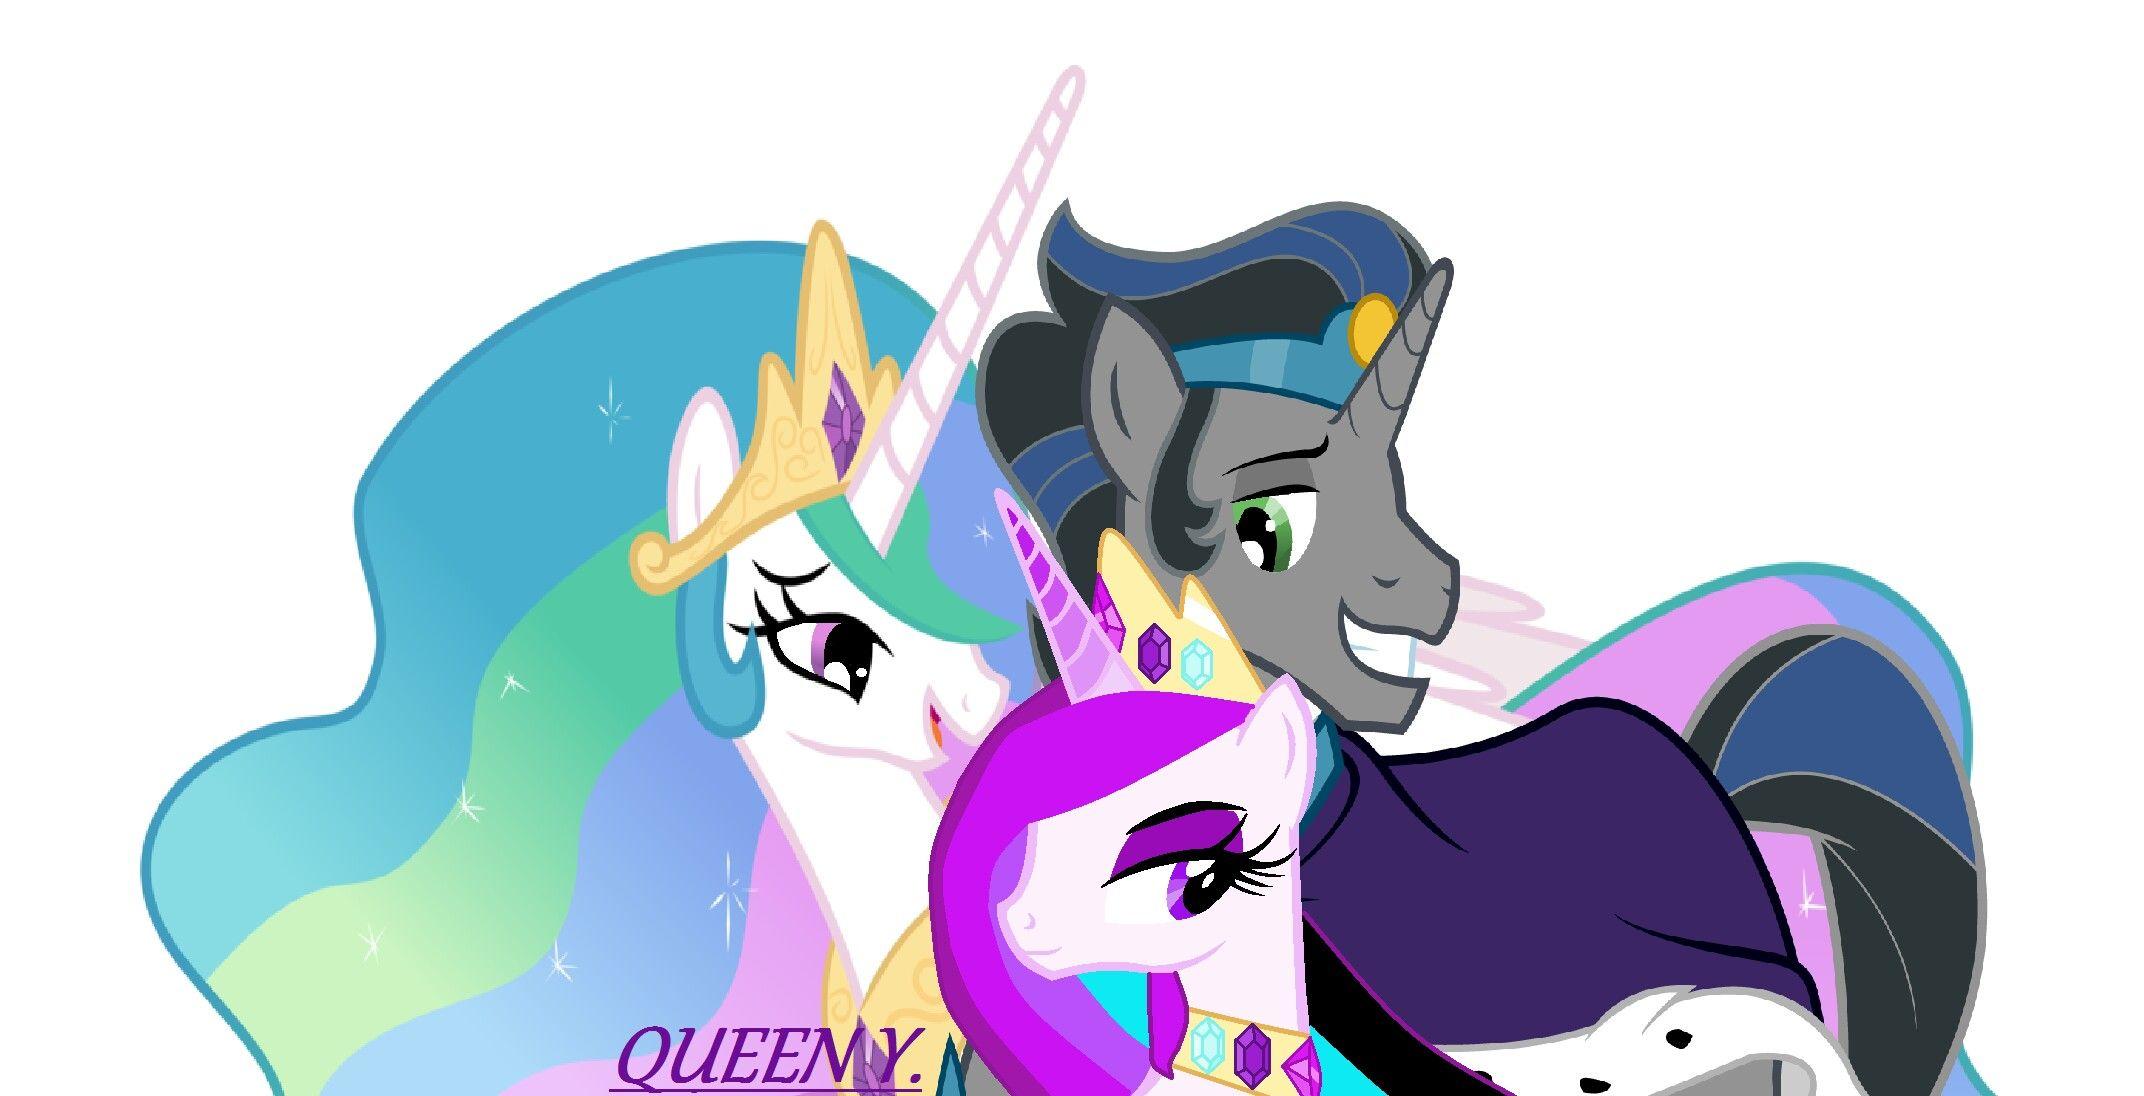 Mlp Royal Family King Sombra Queen Celestia And Princess Rainy